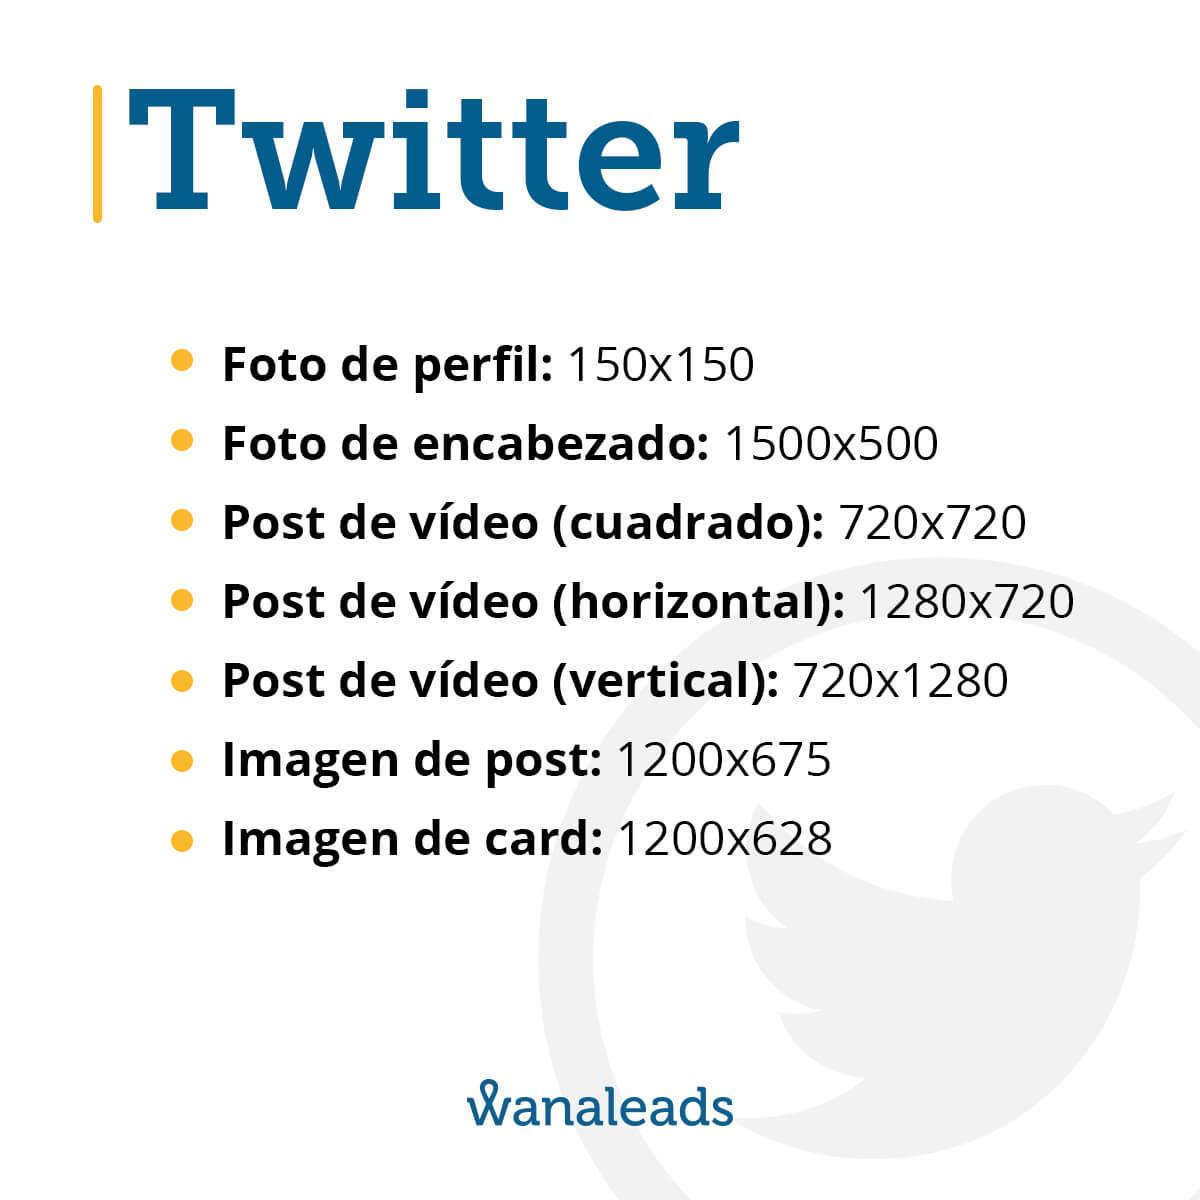 Tamaño de imágenes en redes sociales en 2020 | Twitter